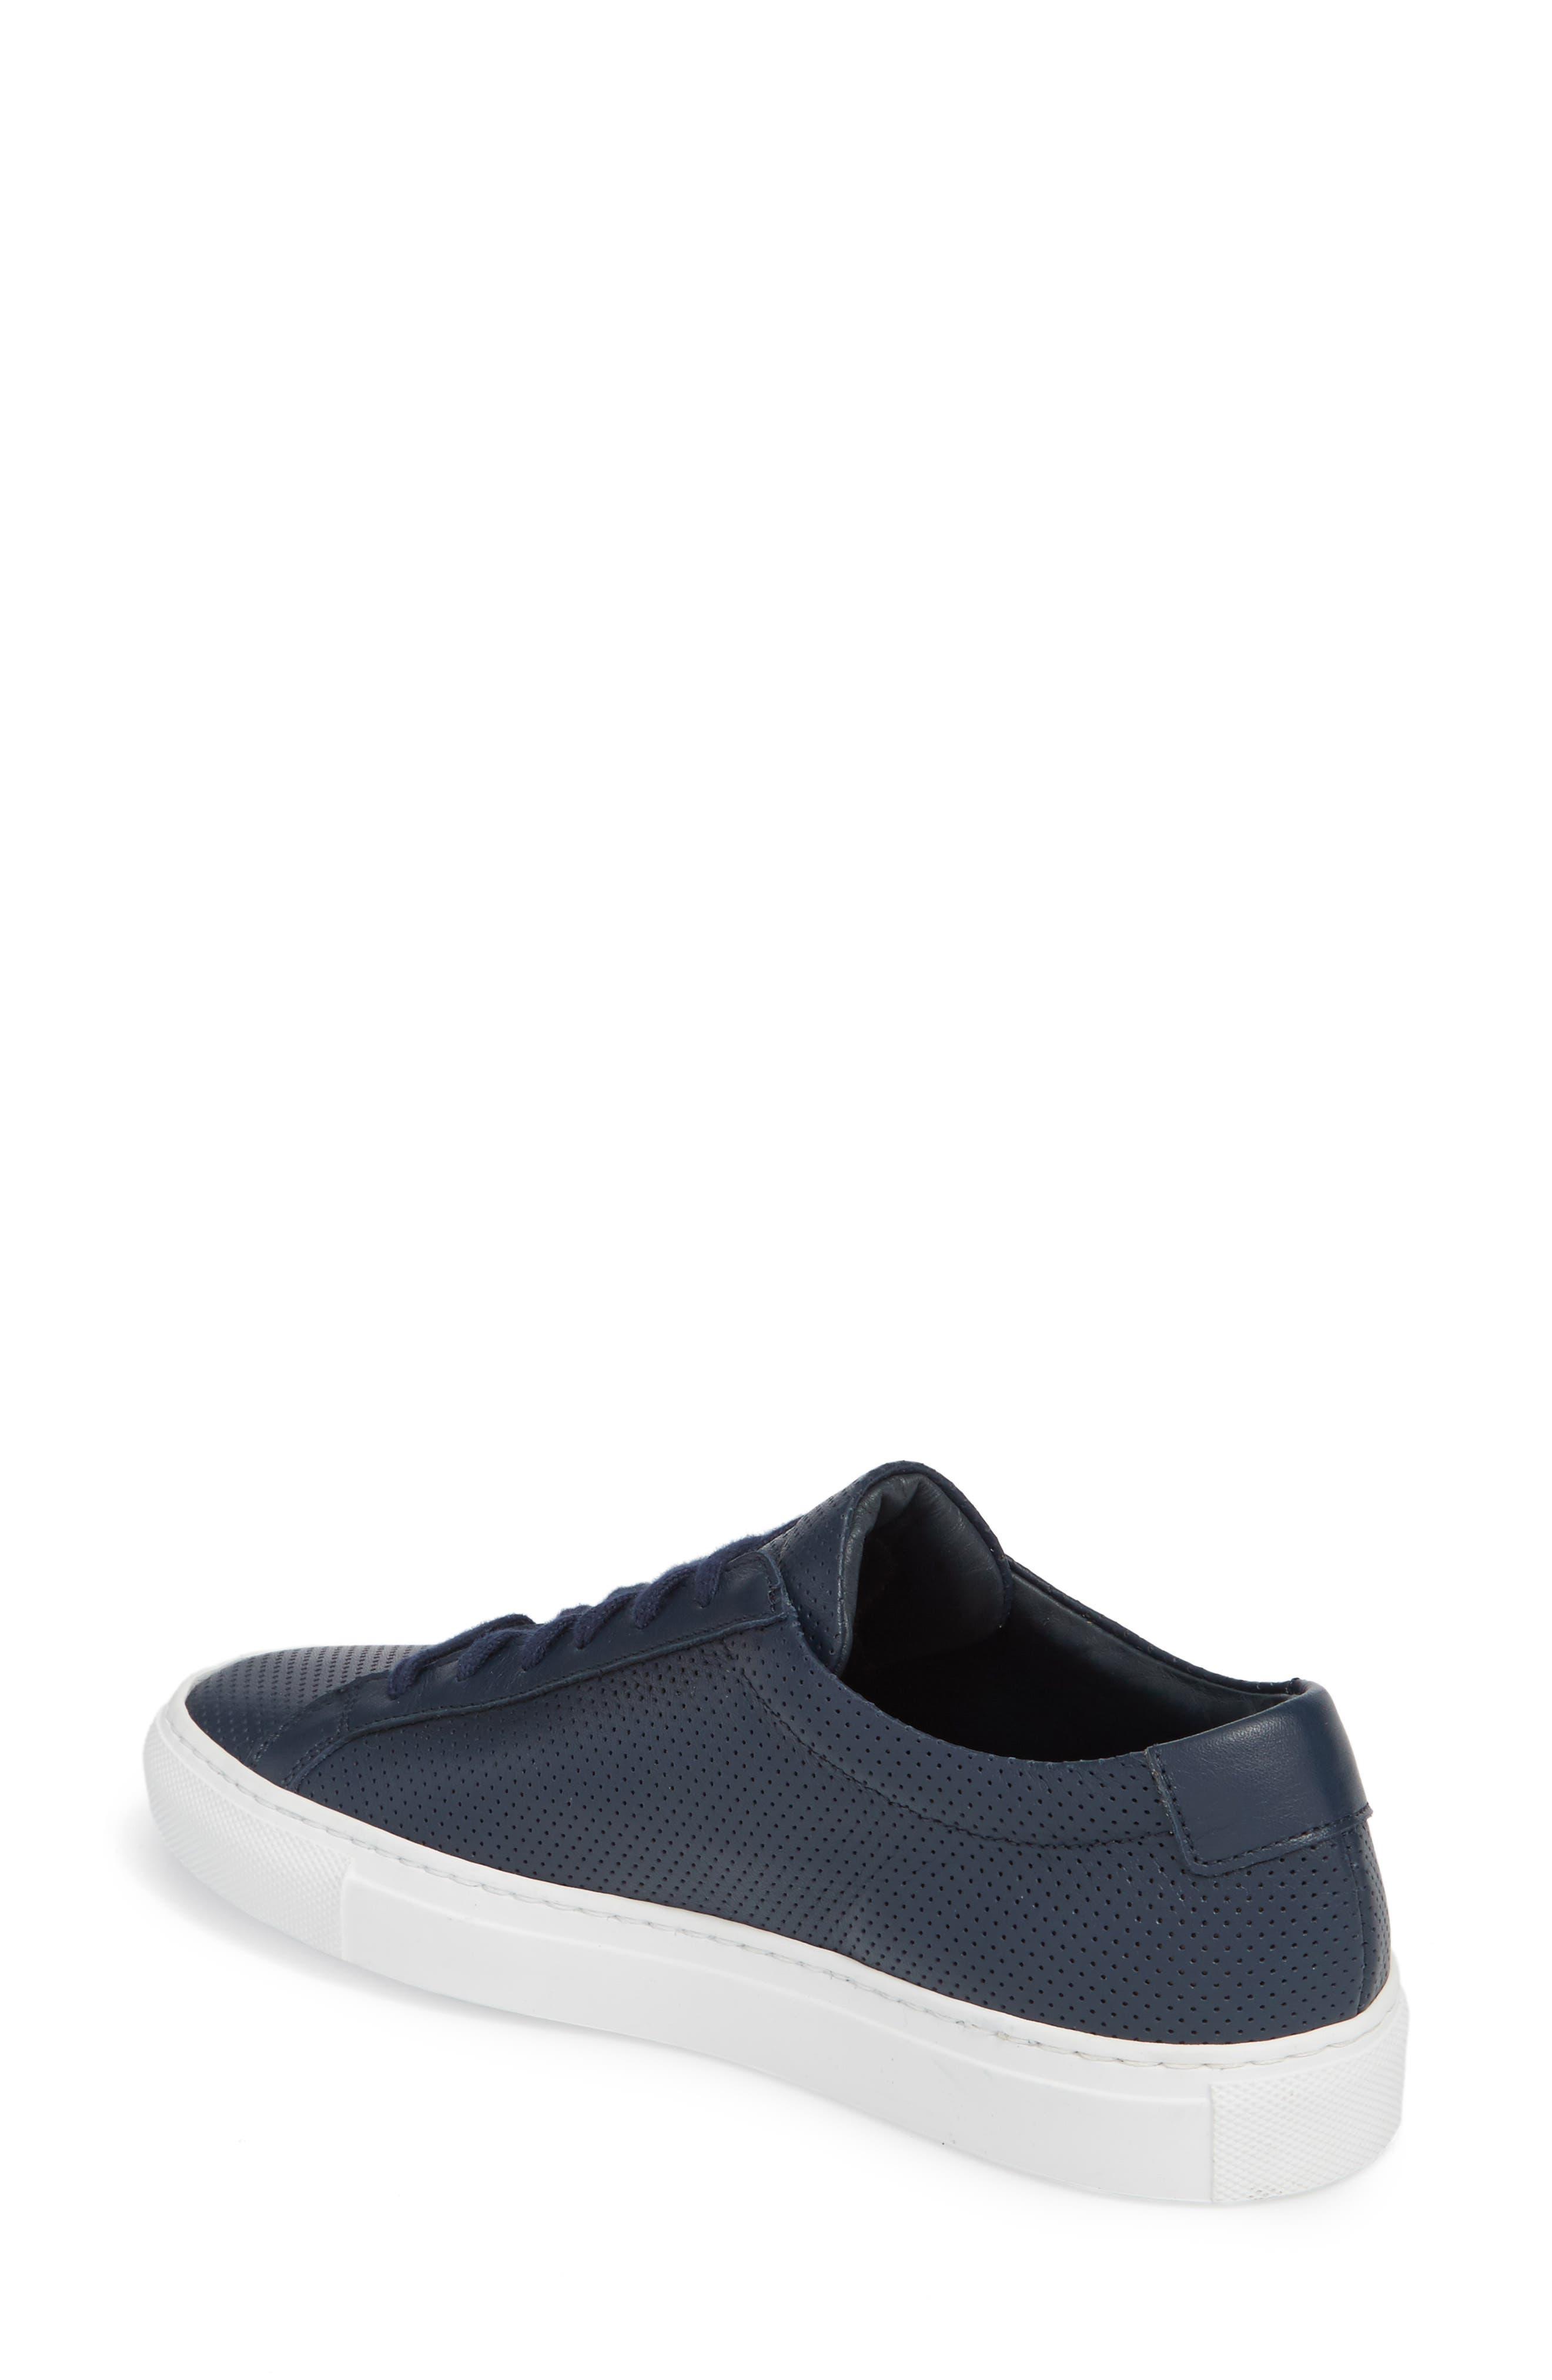 Original Achilles Perforated Low Sneaker,                             Alternate thumbnail 2, color,                             400